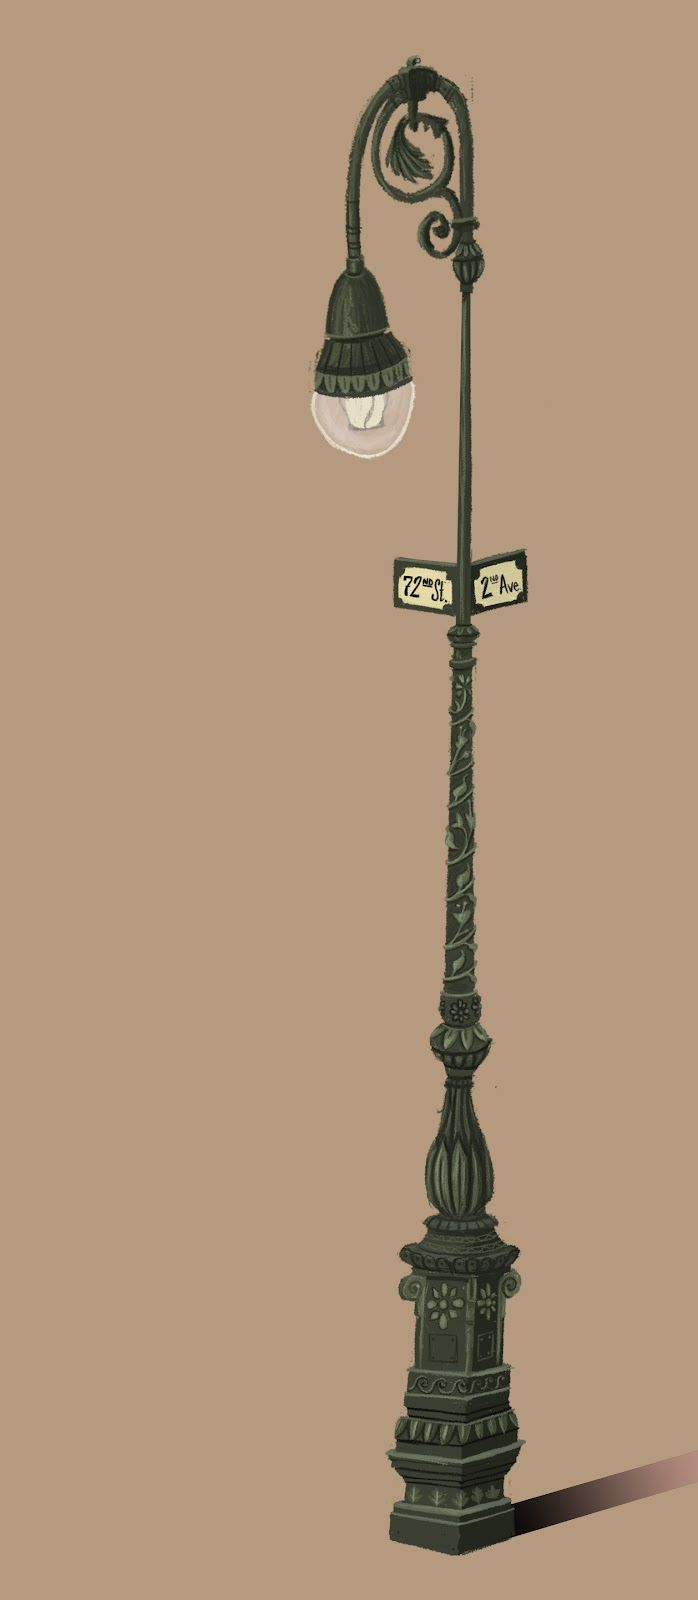 698x1600 Sharackula Gramercy Park Inspired Street Lamp (Copyright Matthew